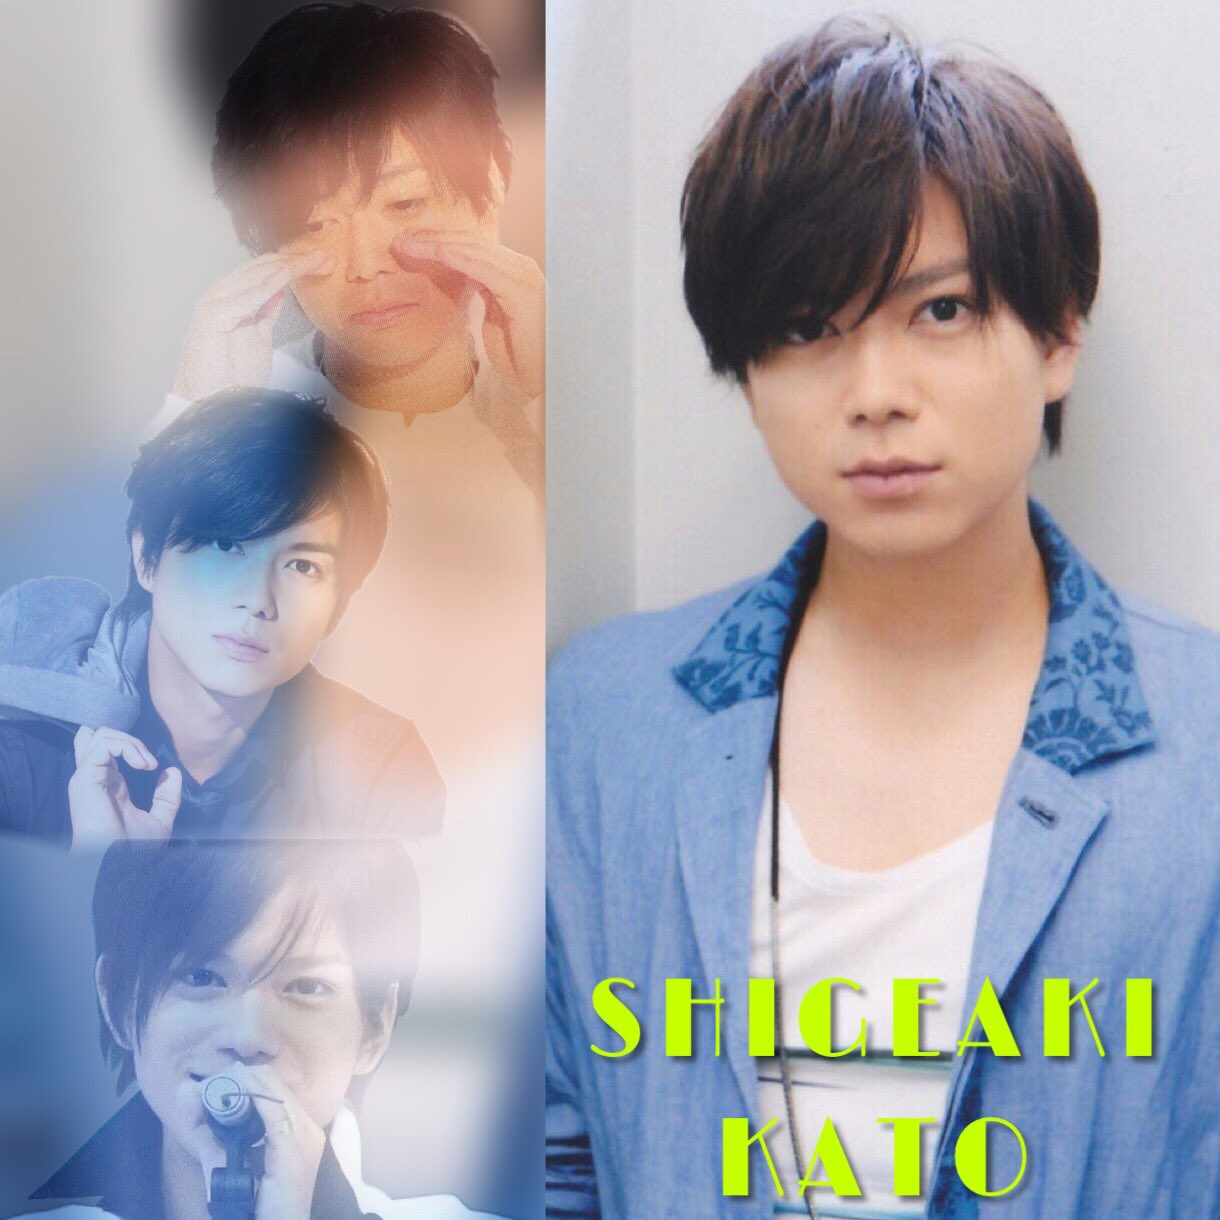 SHIGEAKI KATO     Happy Birthday